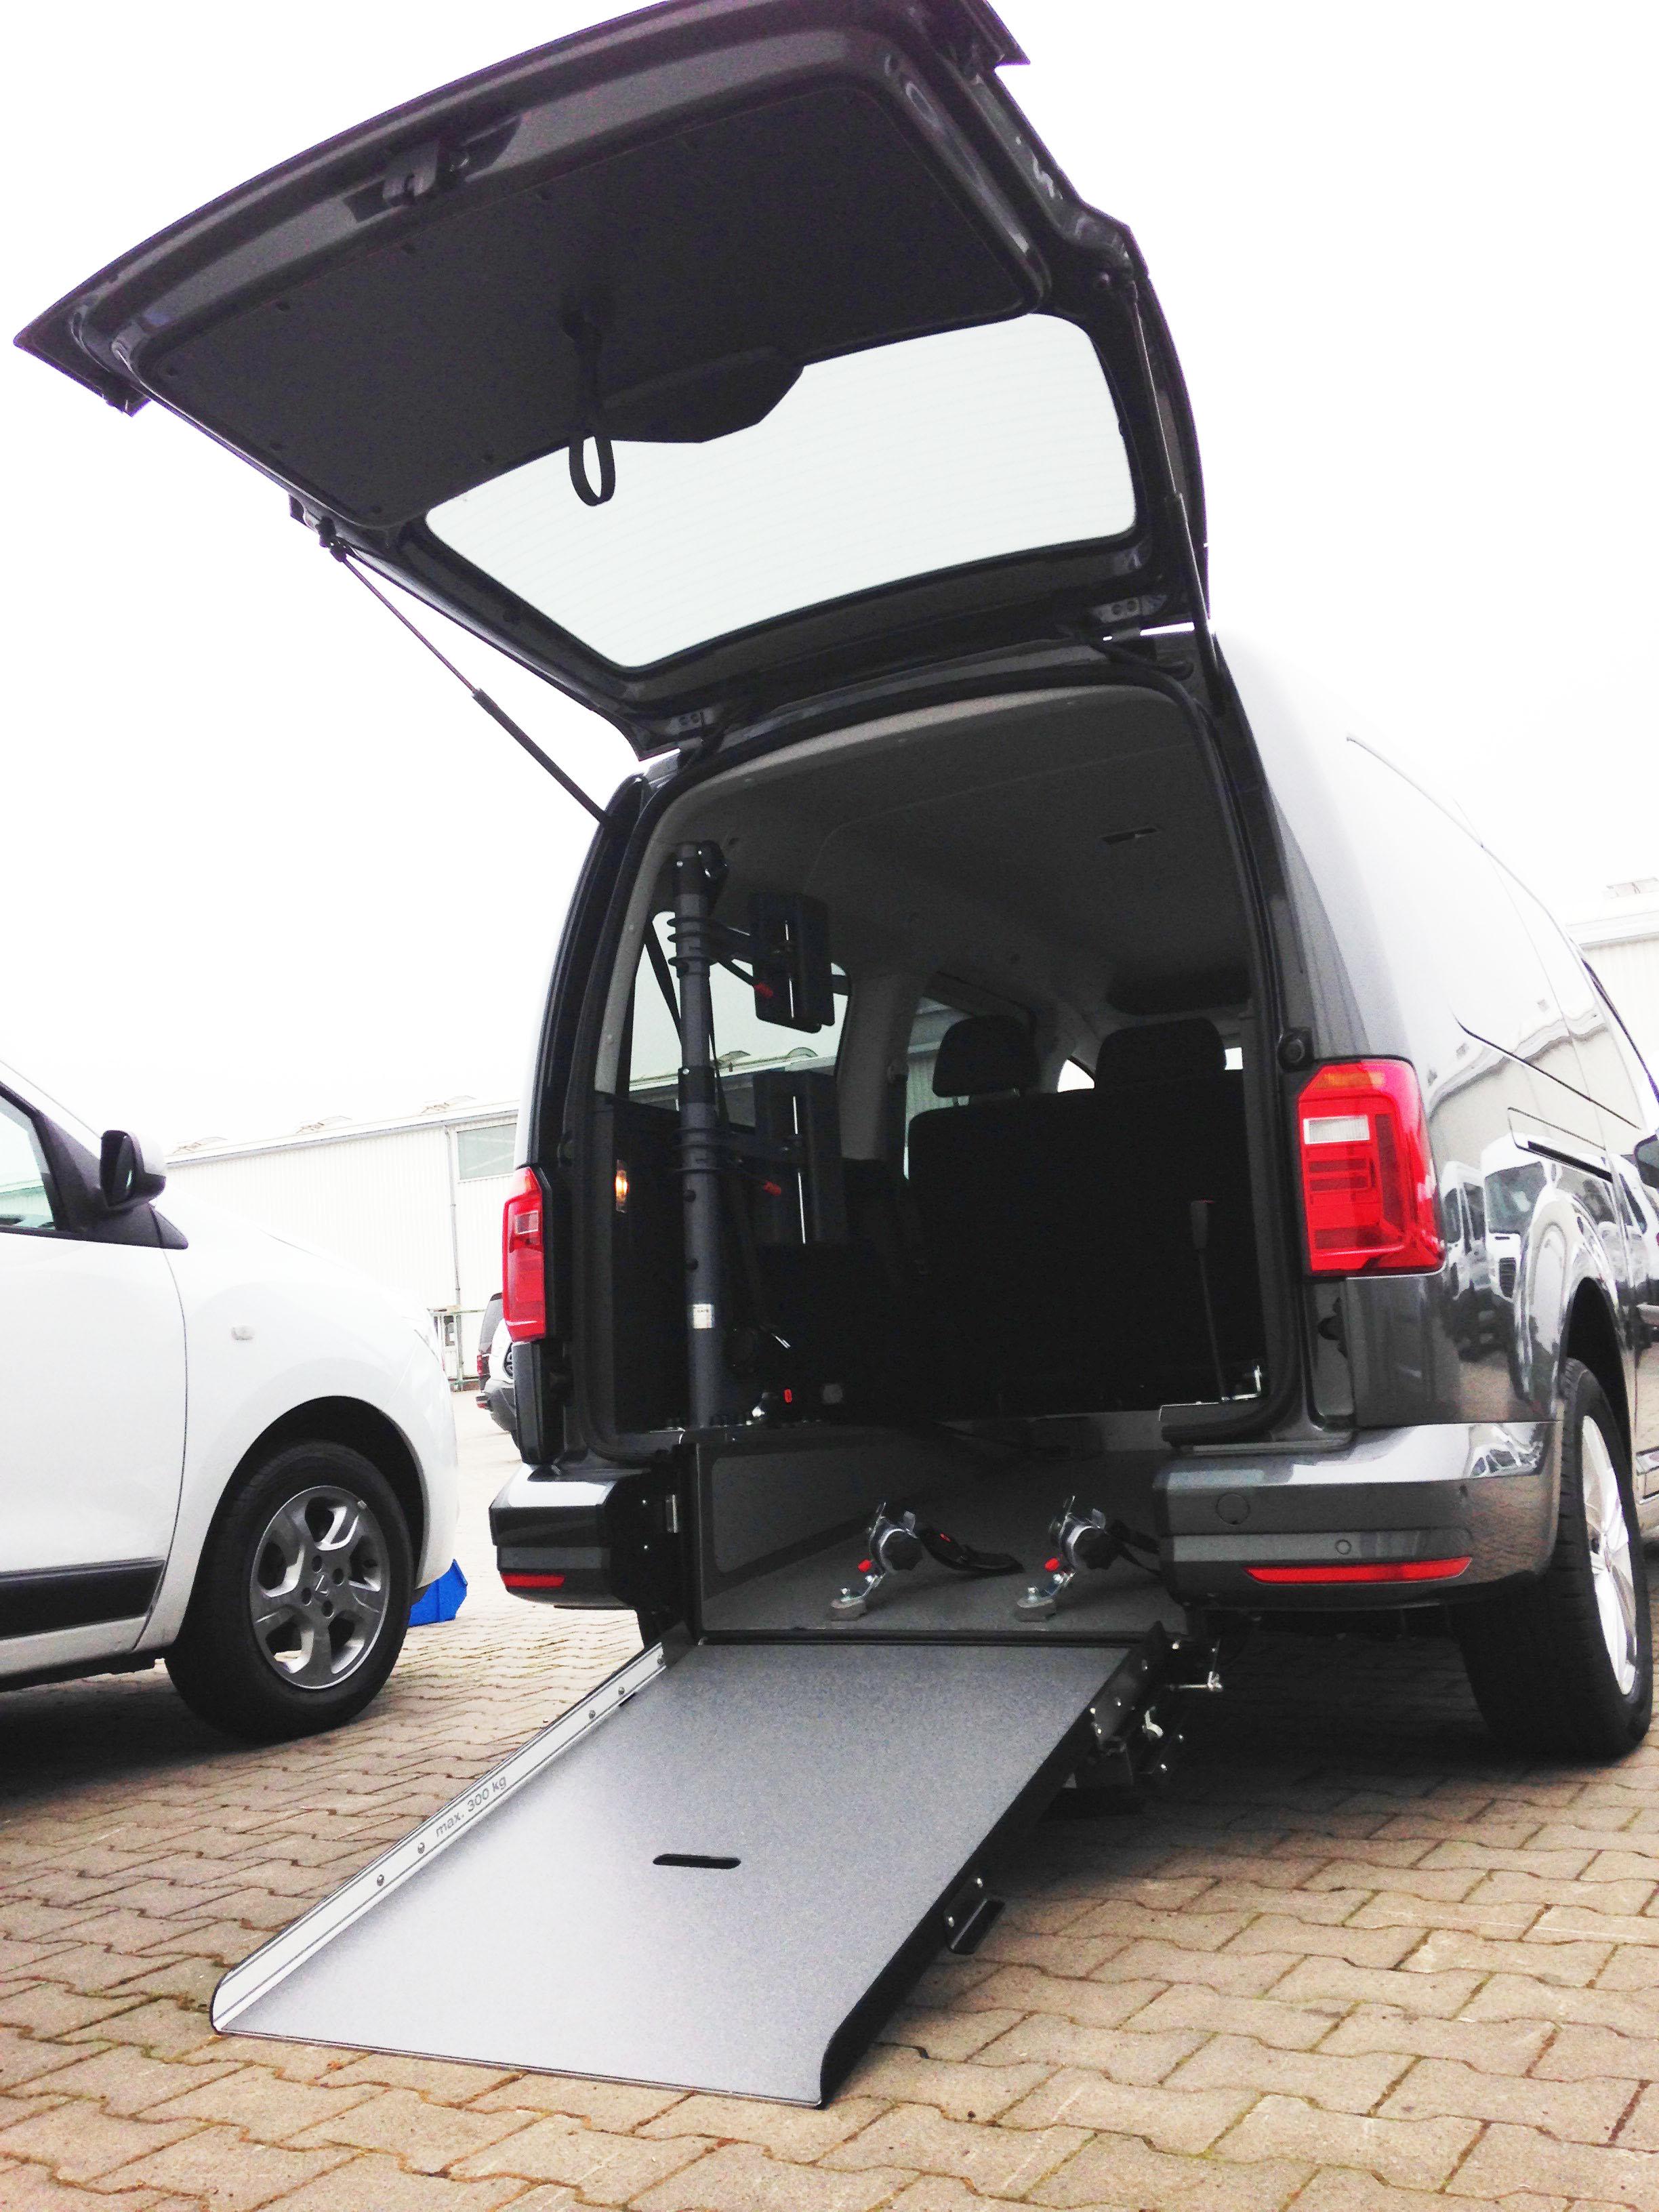 Volkswagen disabili 2016 euro 6